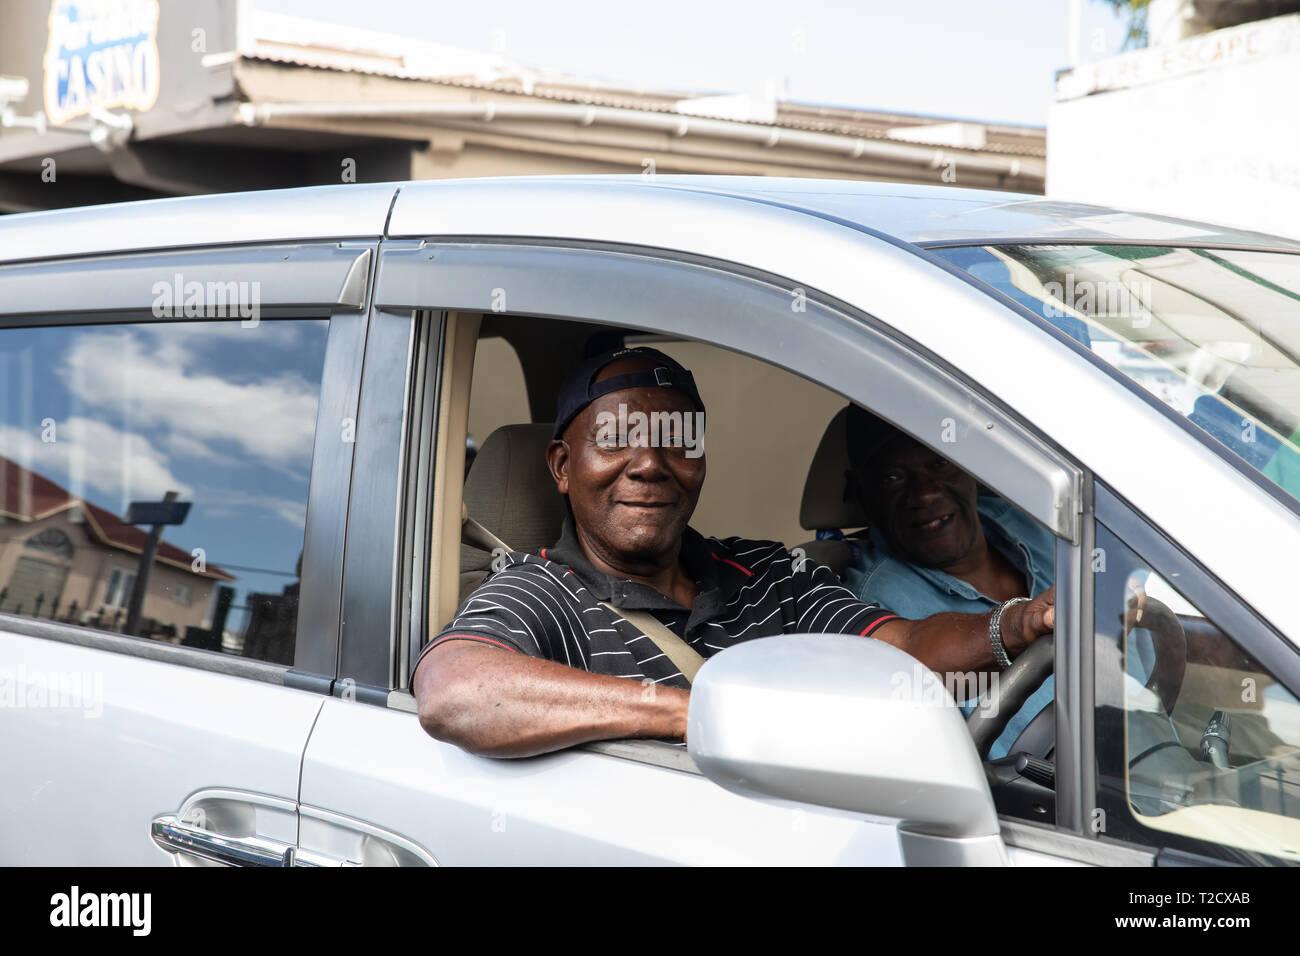 Cab driver smiling in Saint John's, Capital of Antigua and Barbuda Stock Photo